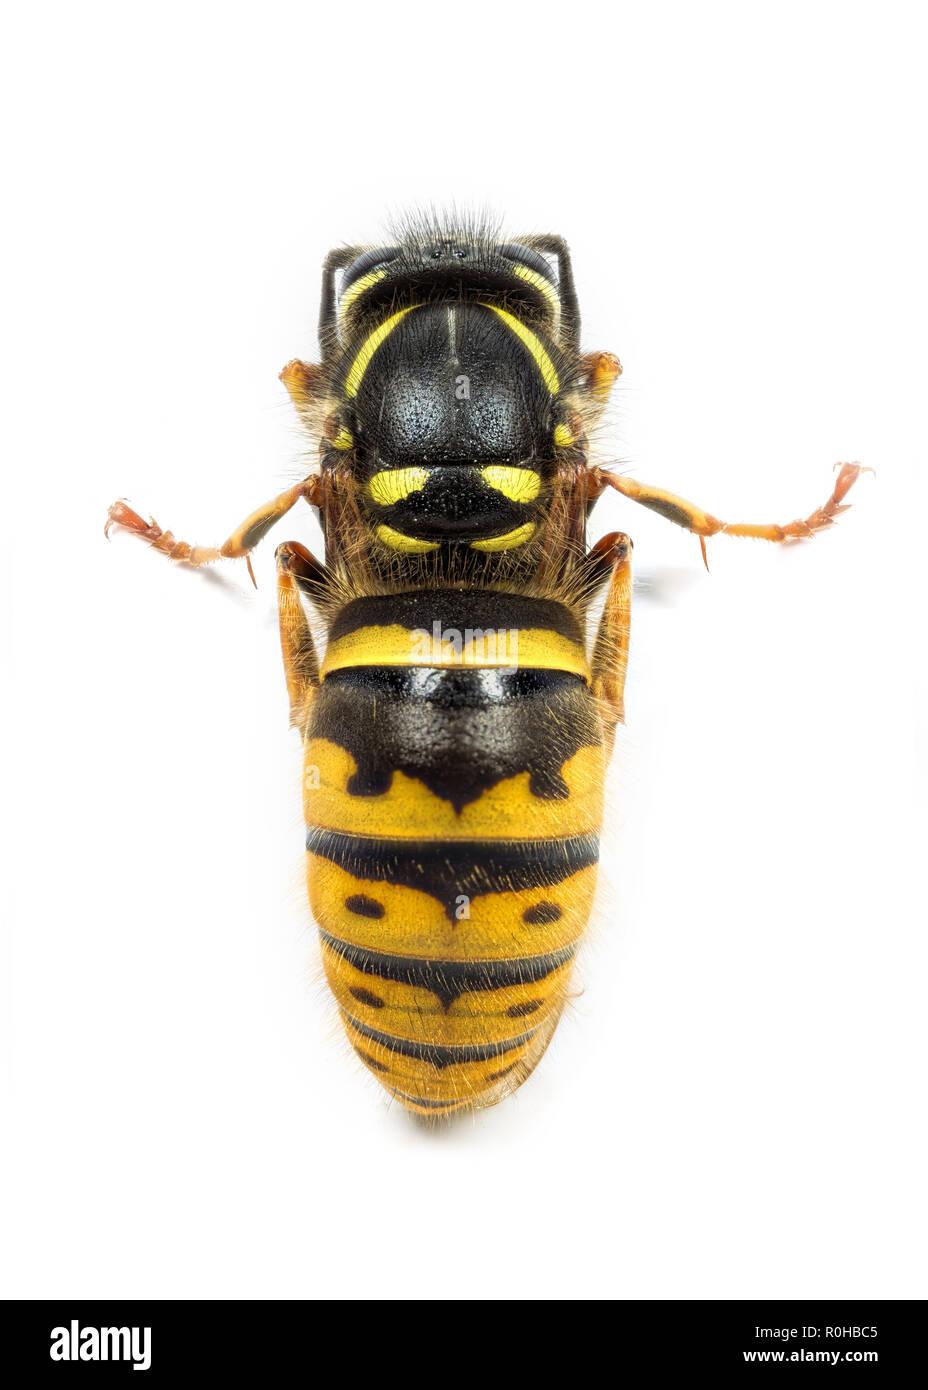 A queen Vespula wasp or yellowjacket preparing to hibernate - Stock Image